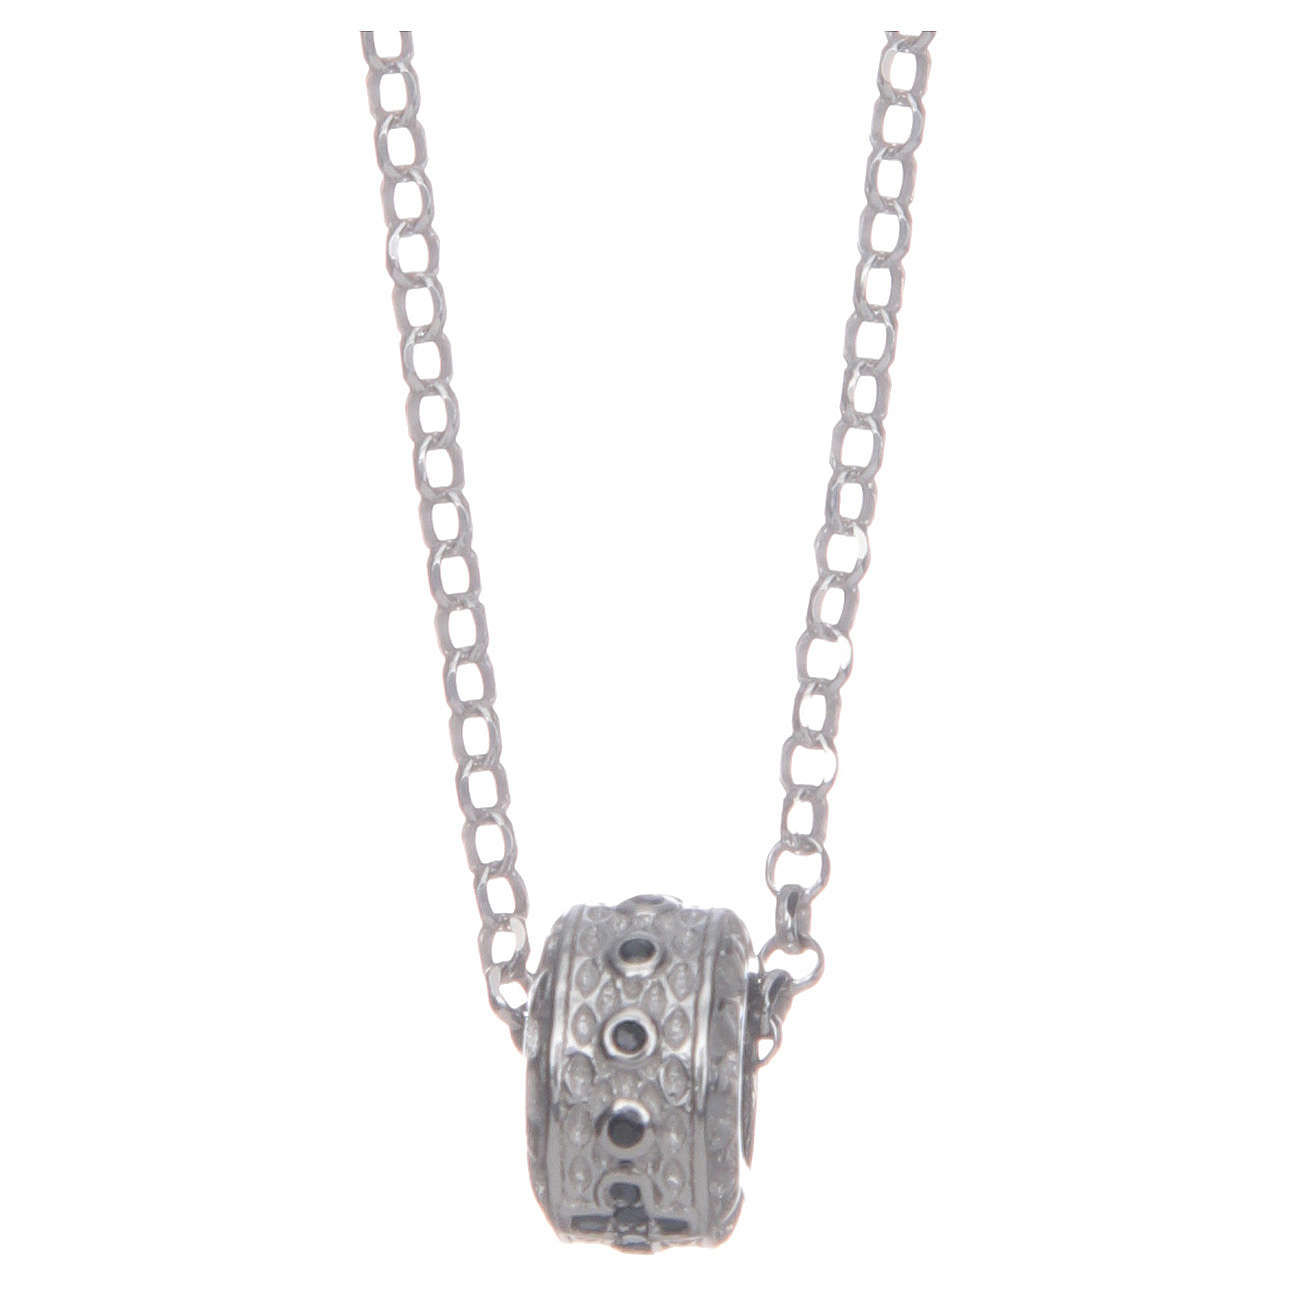 Ciondolo rosario nero argento 925 4